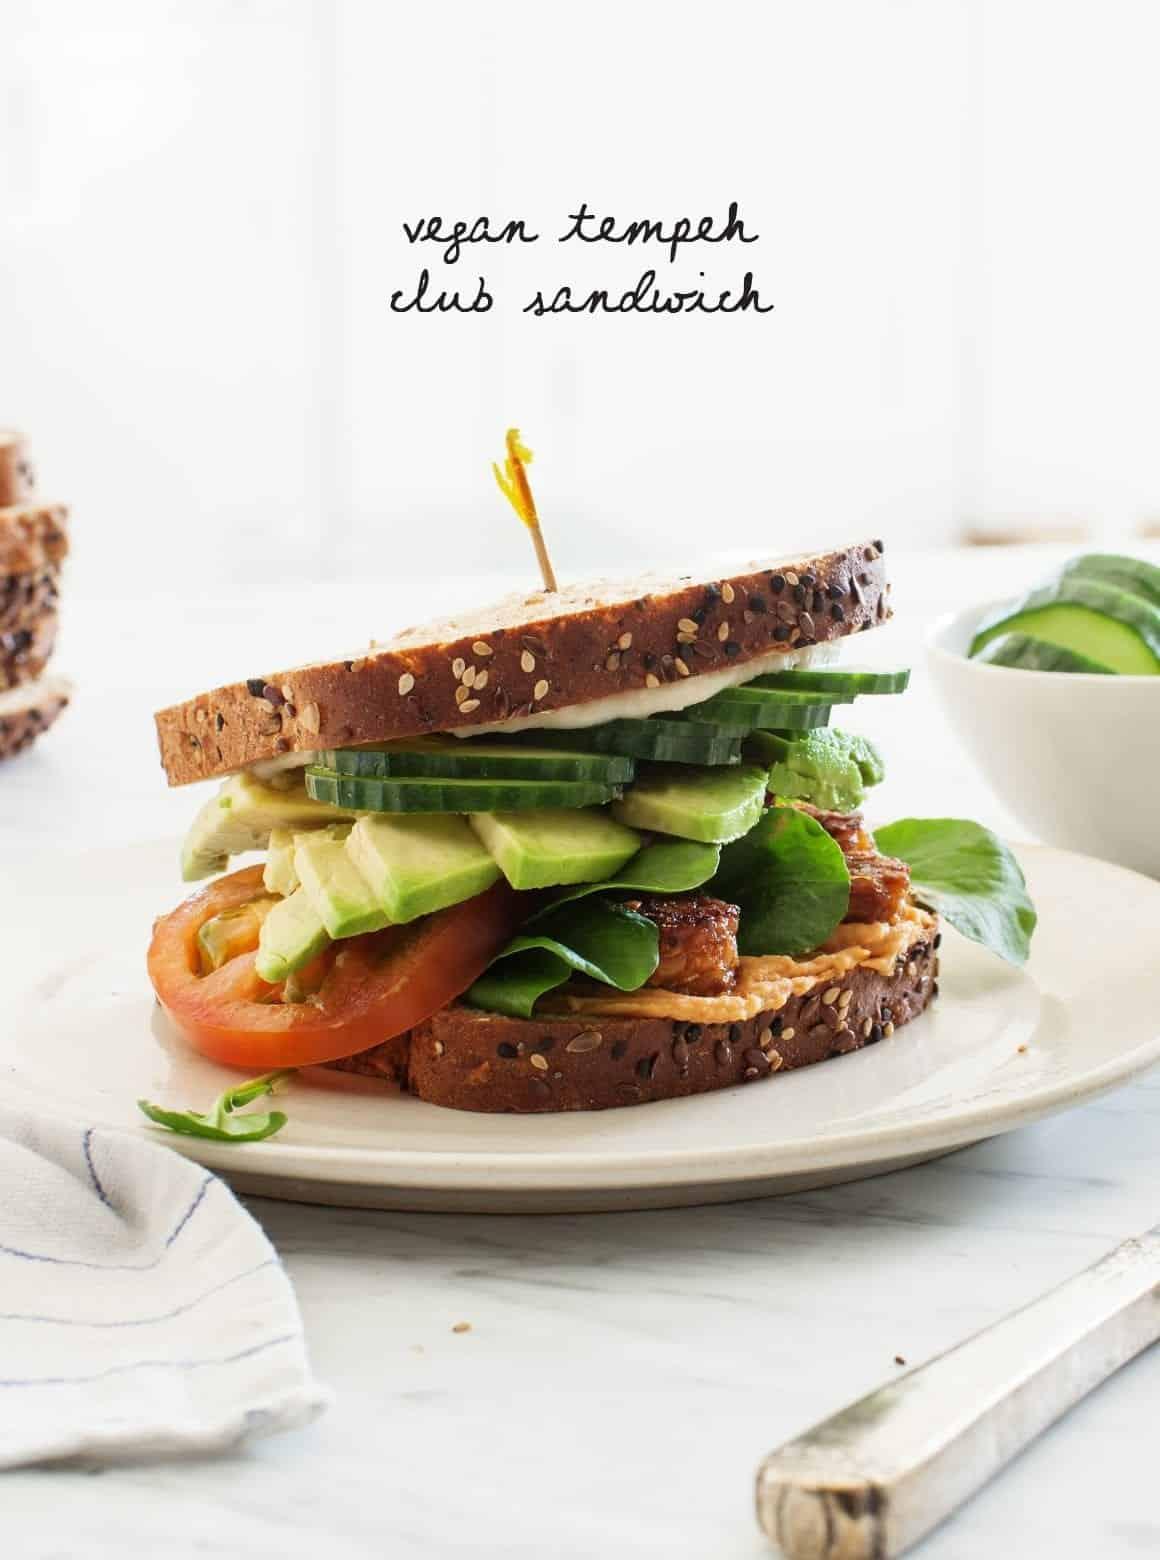 Tempeh Vegan Club Sandwich on a plate